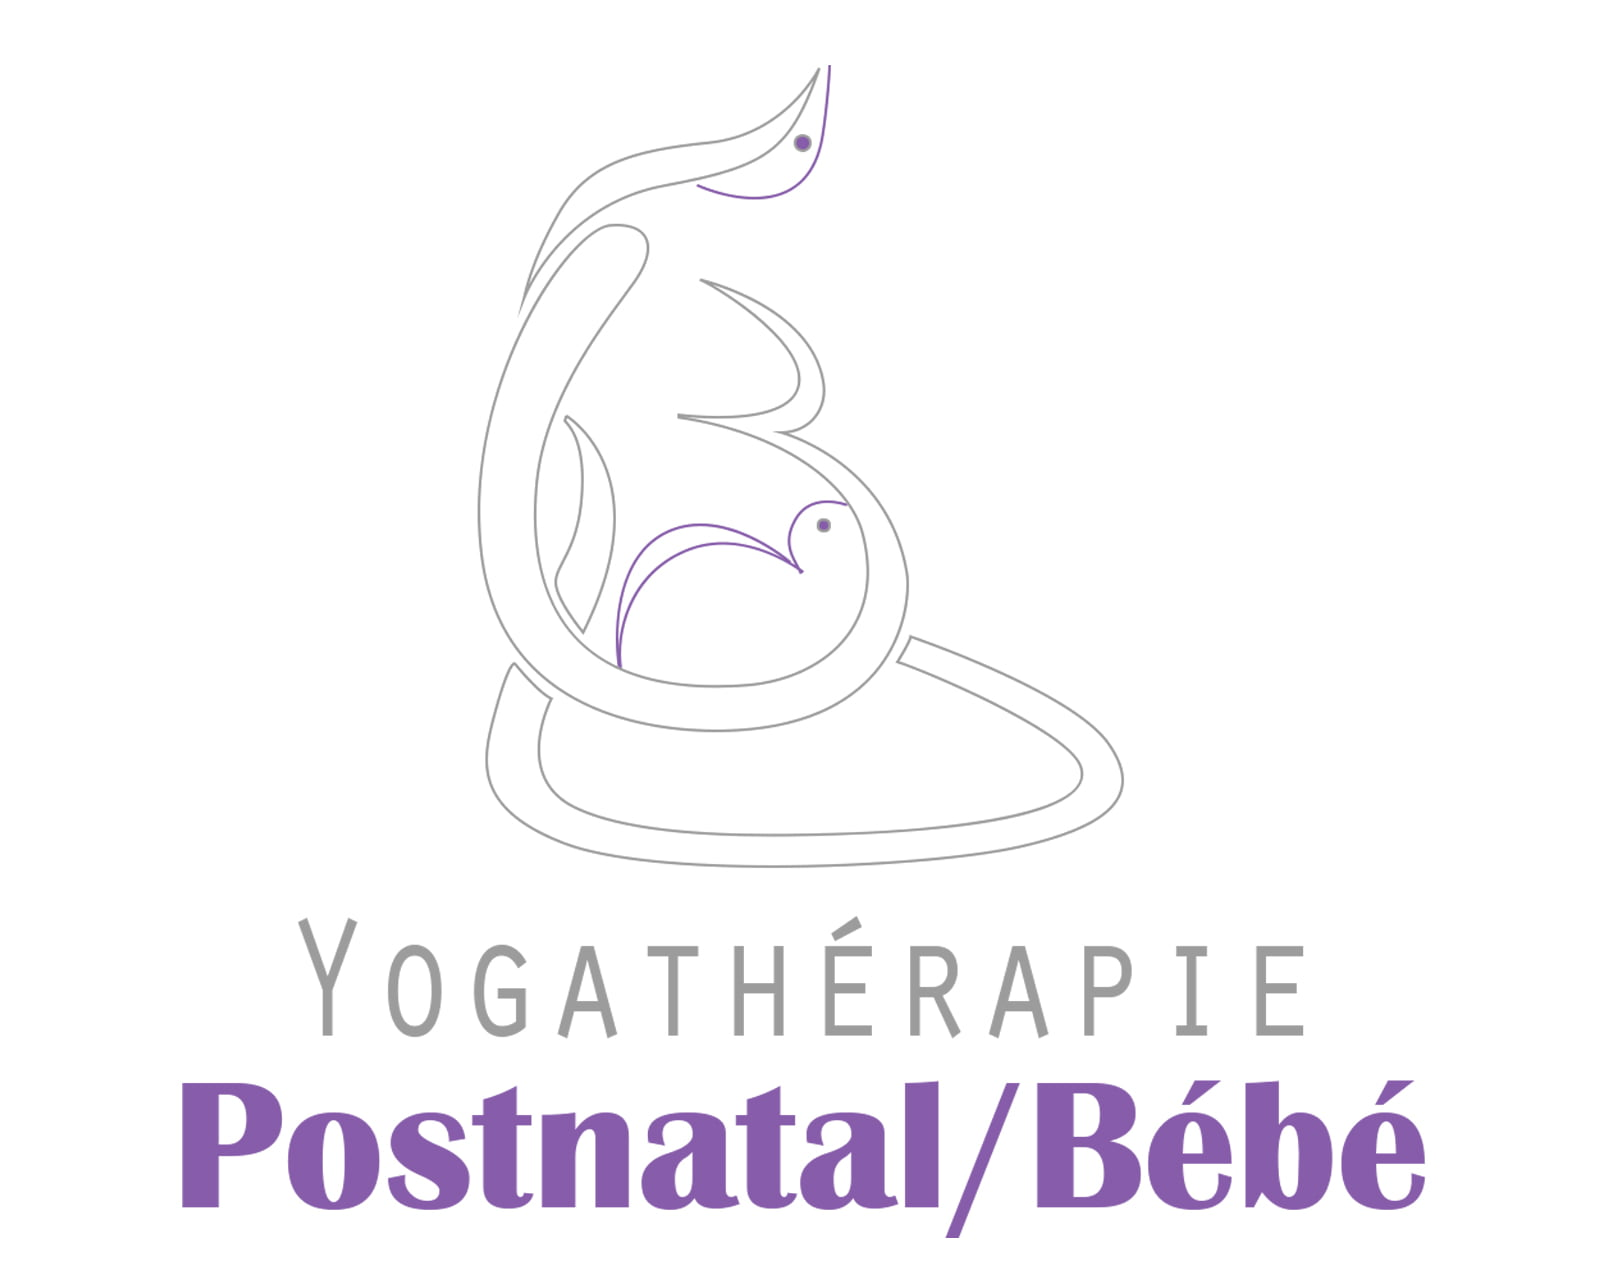 Postnatal bebe